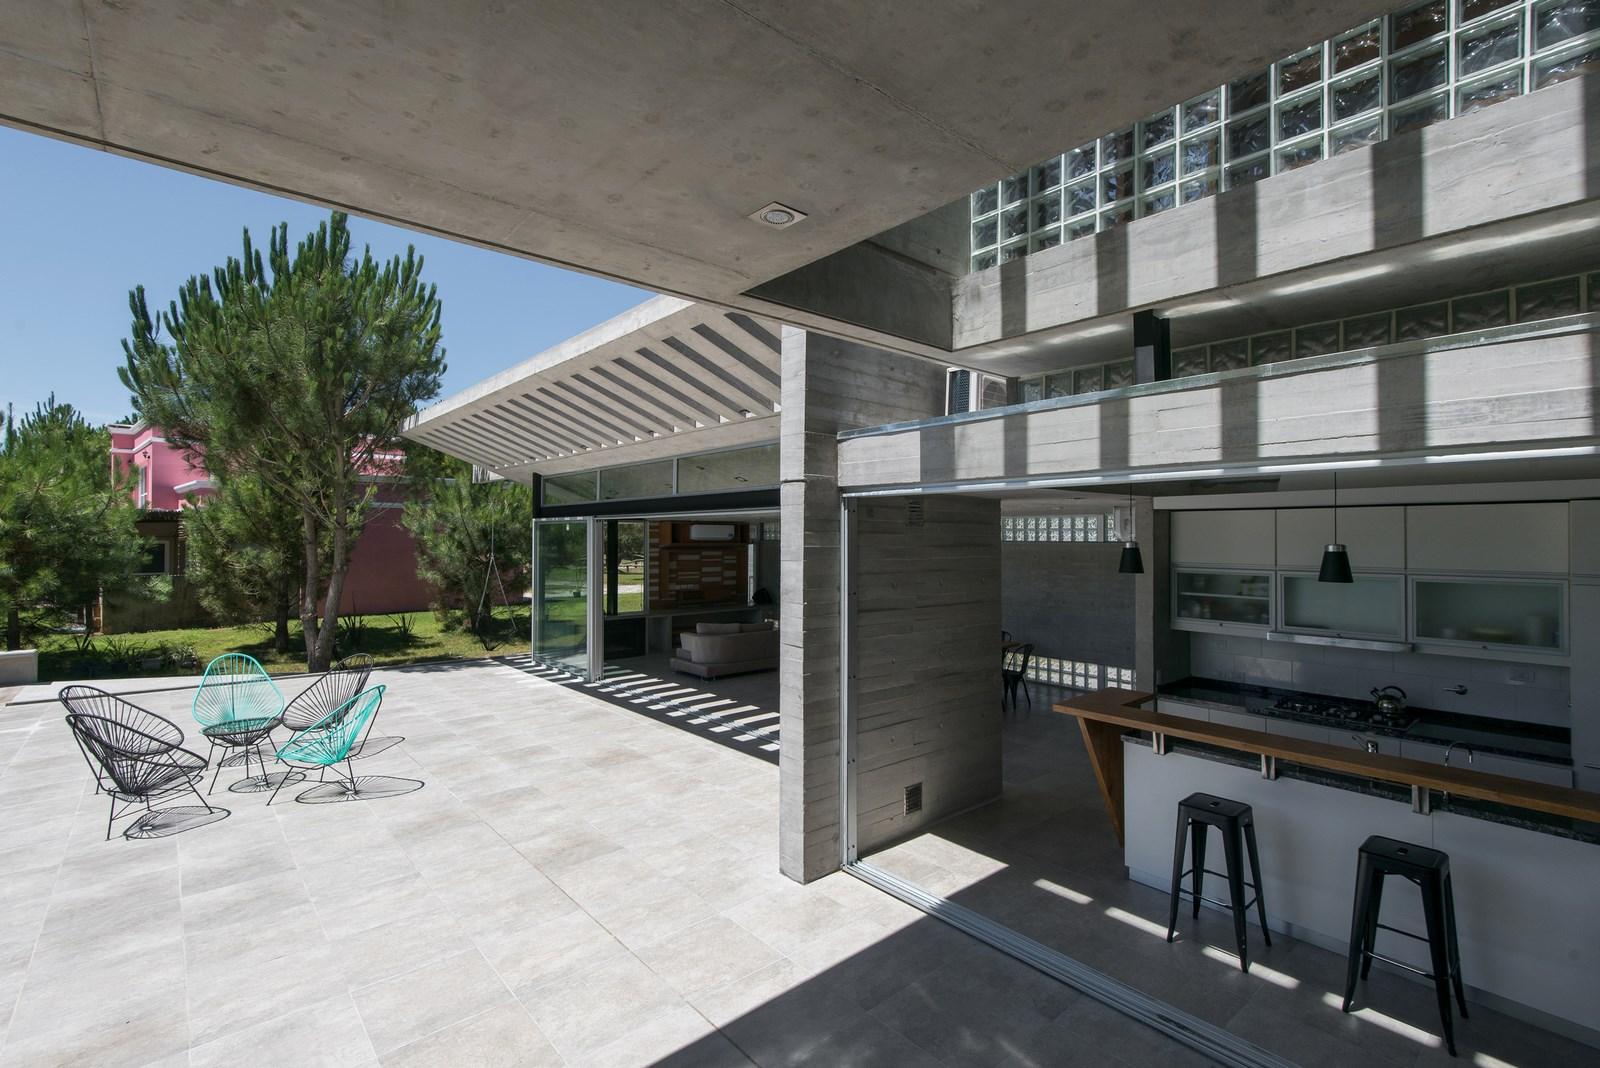 Casa AYYA - Estudio Galera - Foto © Diego Medina 064 (Copy)